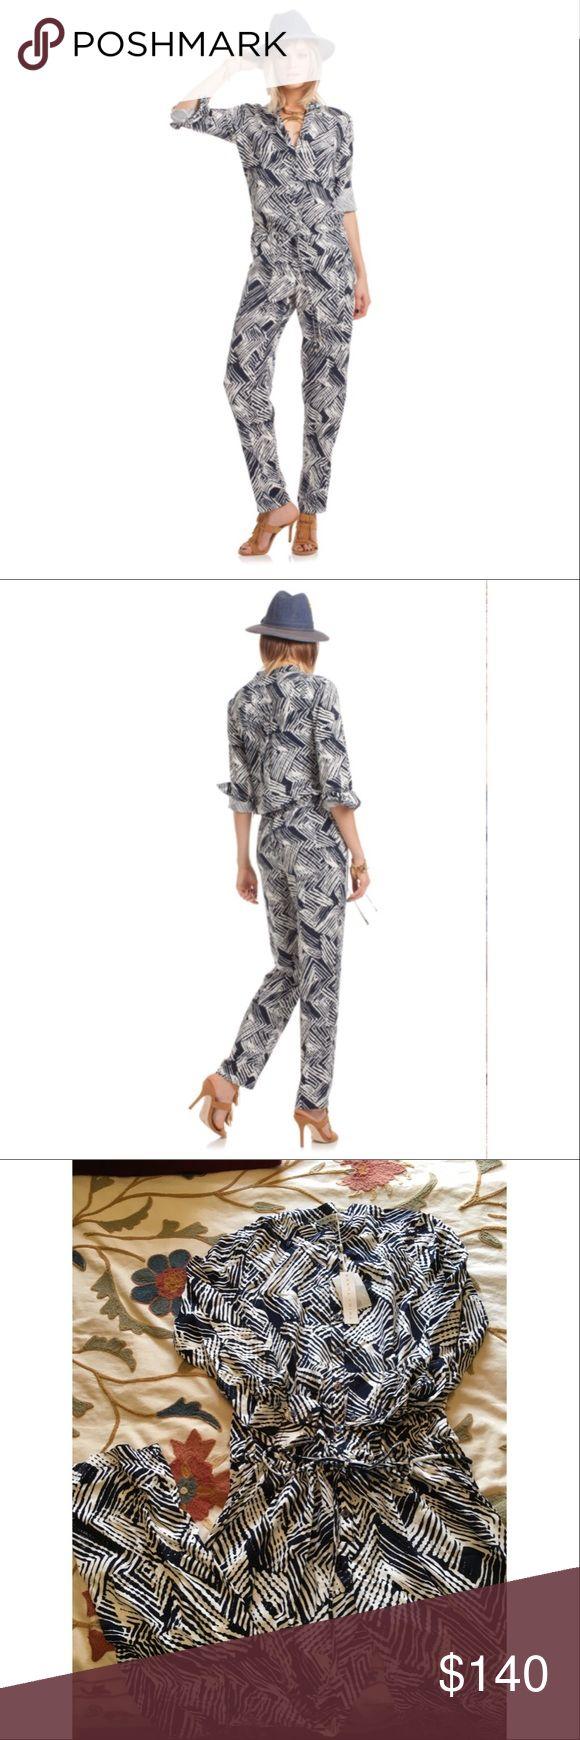 Trina Turk jumpsuit Brand NWT Trina Turk jumpsuit. Navy and cream design. Soft comfortable fabric. Trina Turk Pants Jumpsuits & Rompers